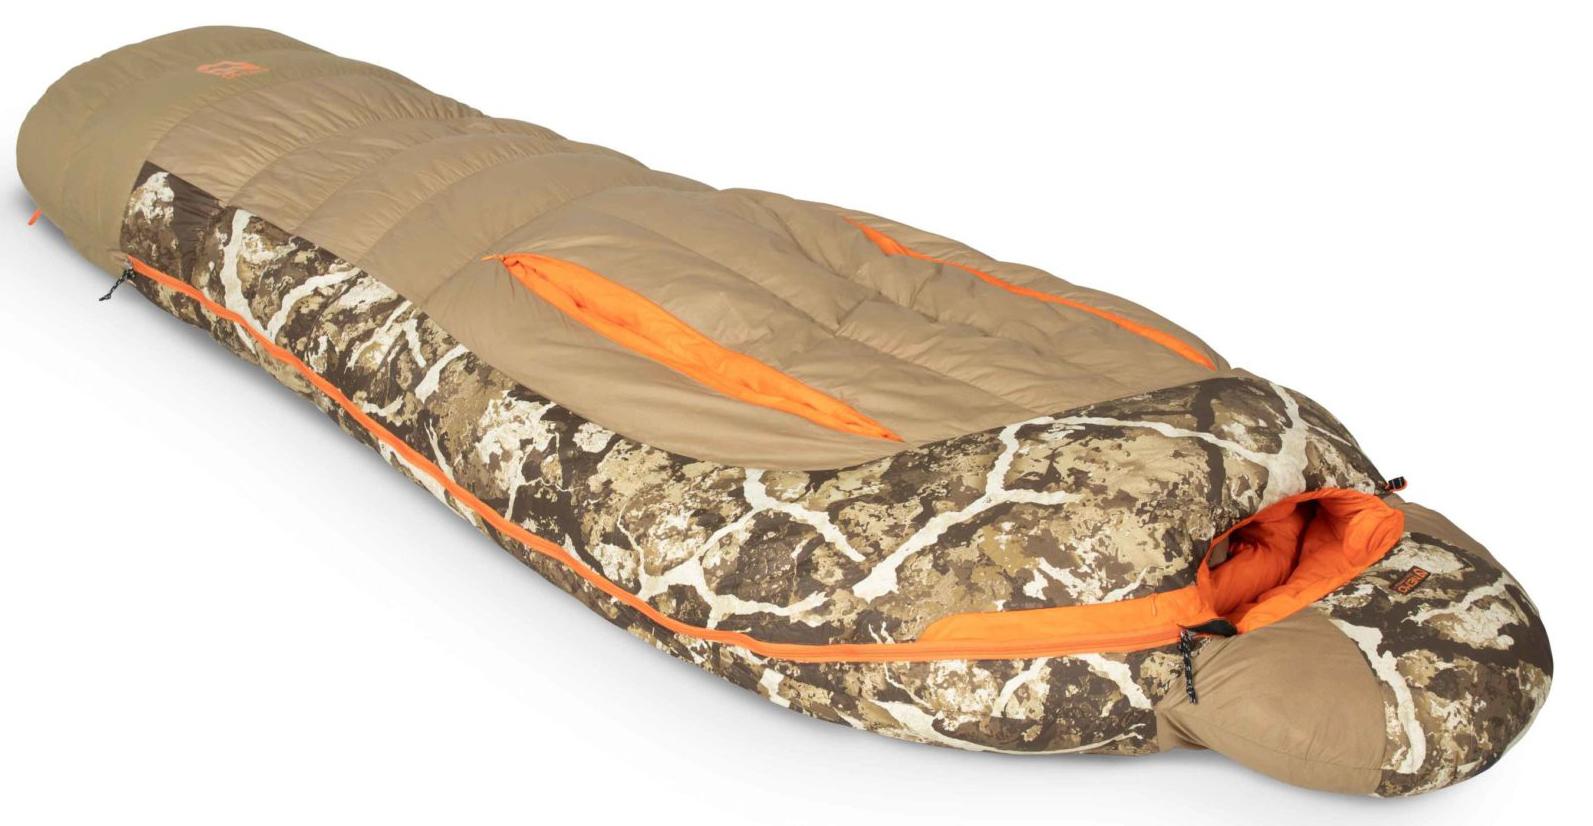 NEMO Stalker sleeping bag